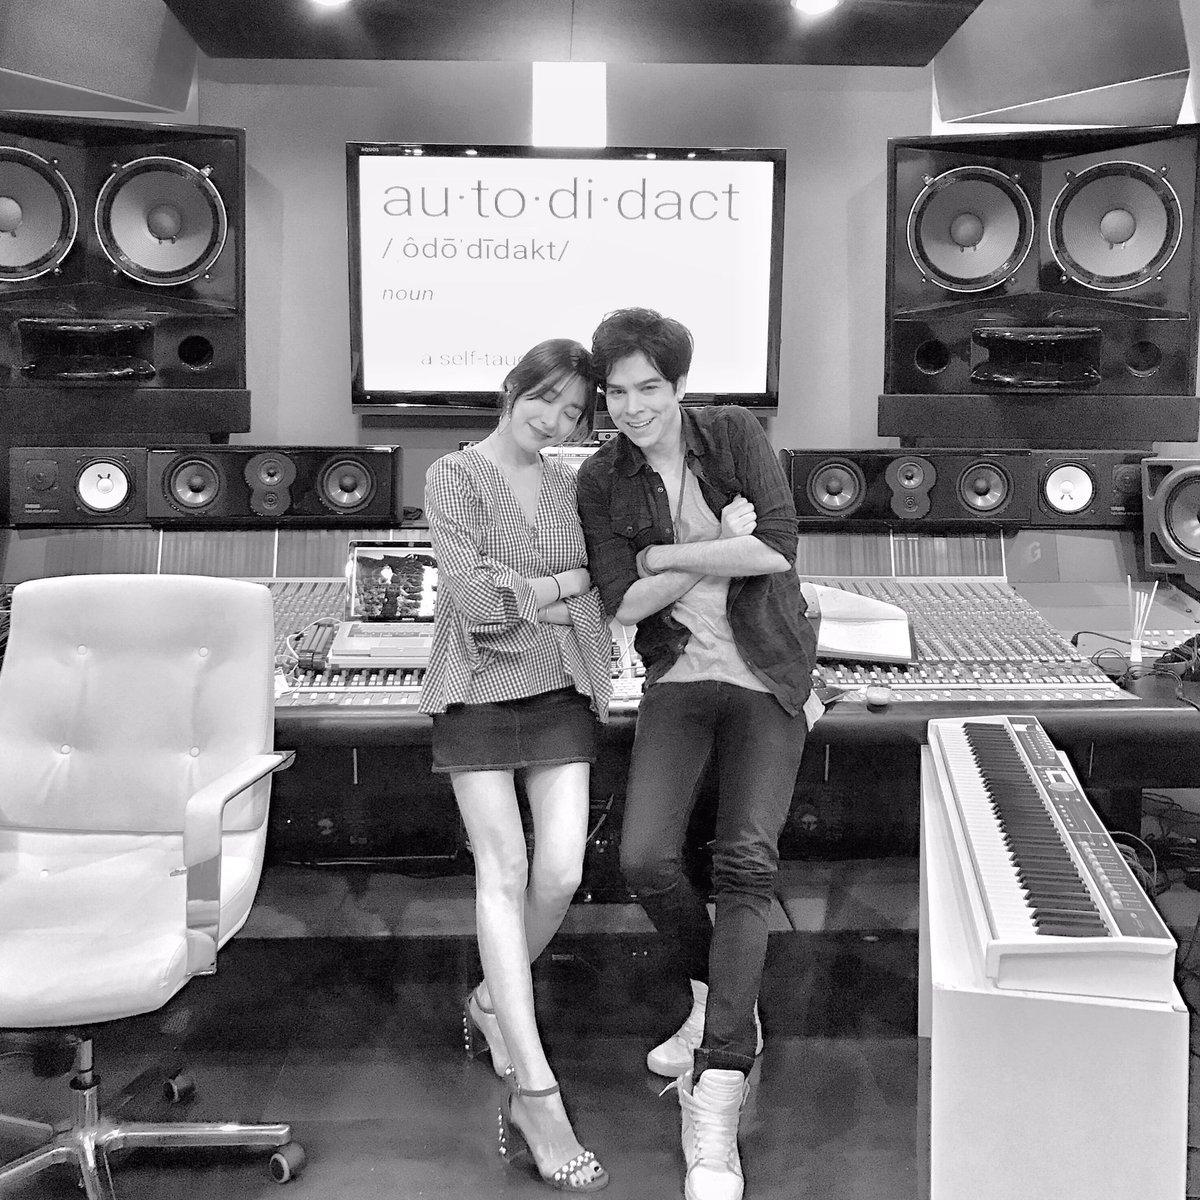 Paradise Studios welcomes this lovely K-Pop princess @xolovestephi from @GirlsGeneration https://t.co/bD5flOmIMb